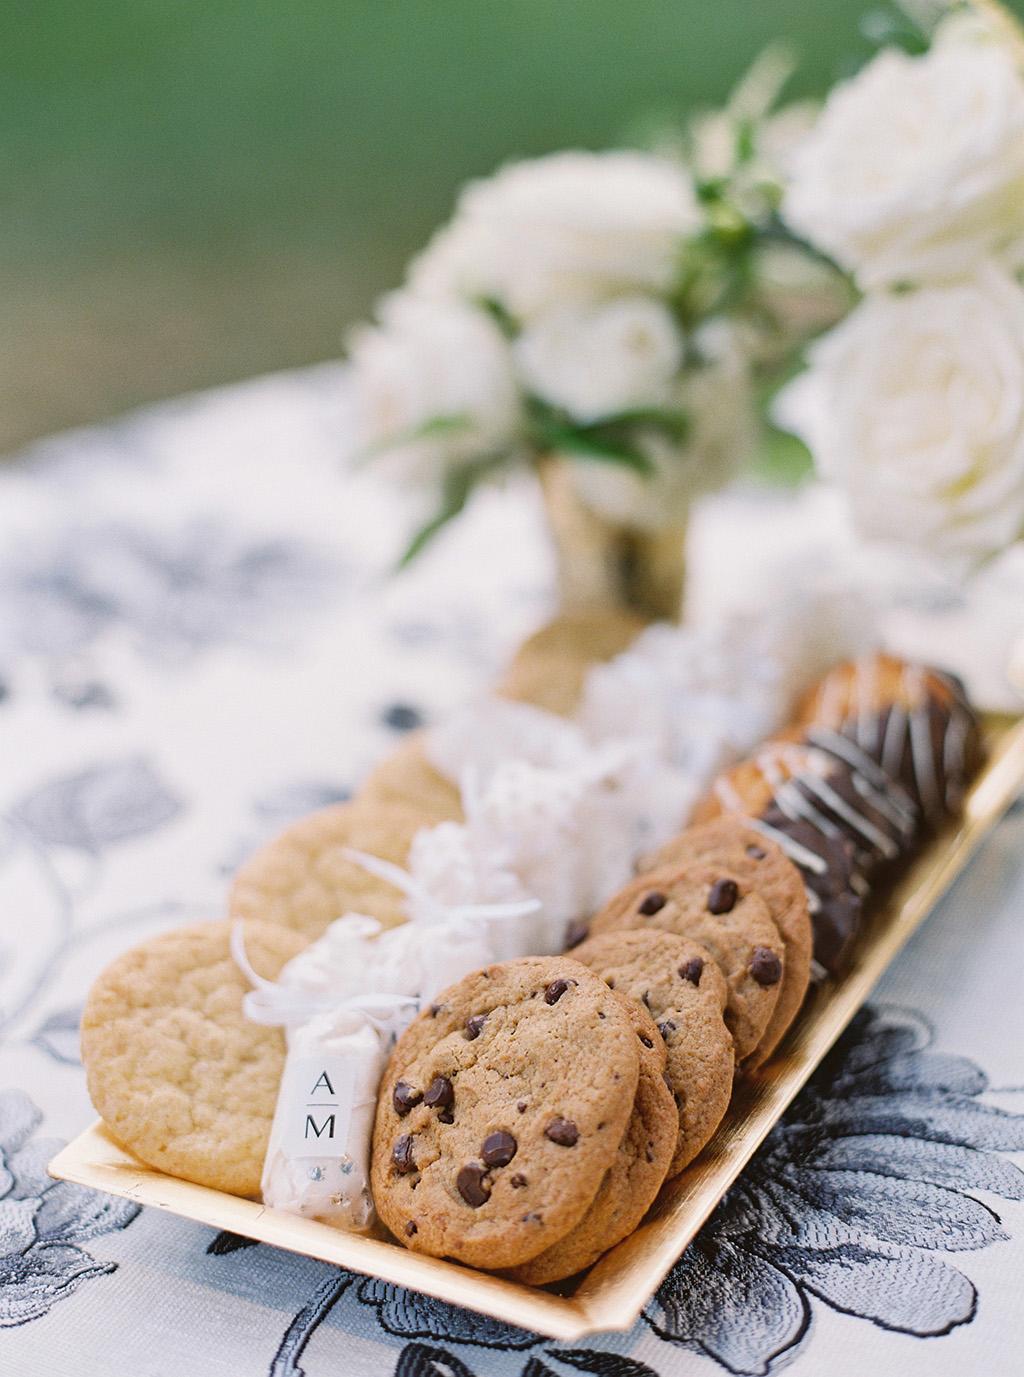 Amelia_Johnson_Photography_Antonella&Matthew_wedding18.1